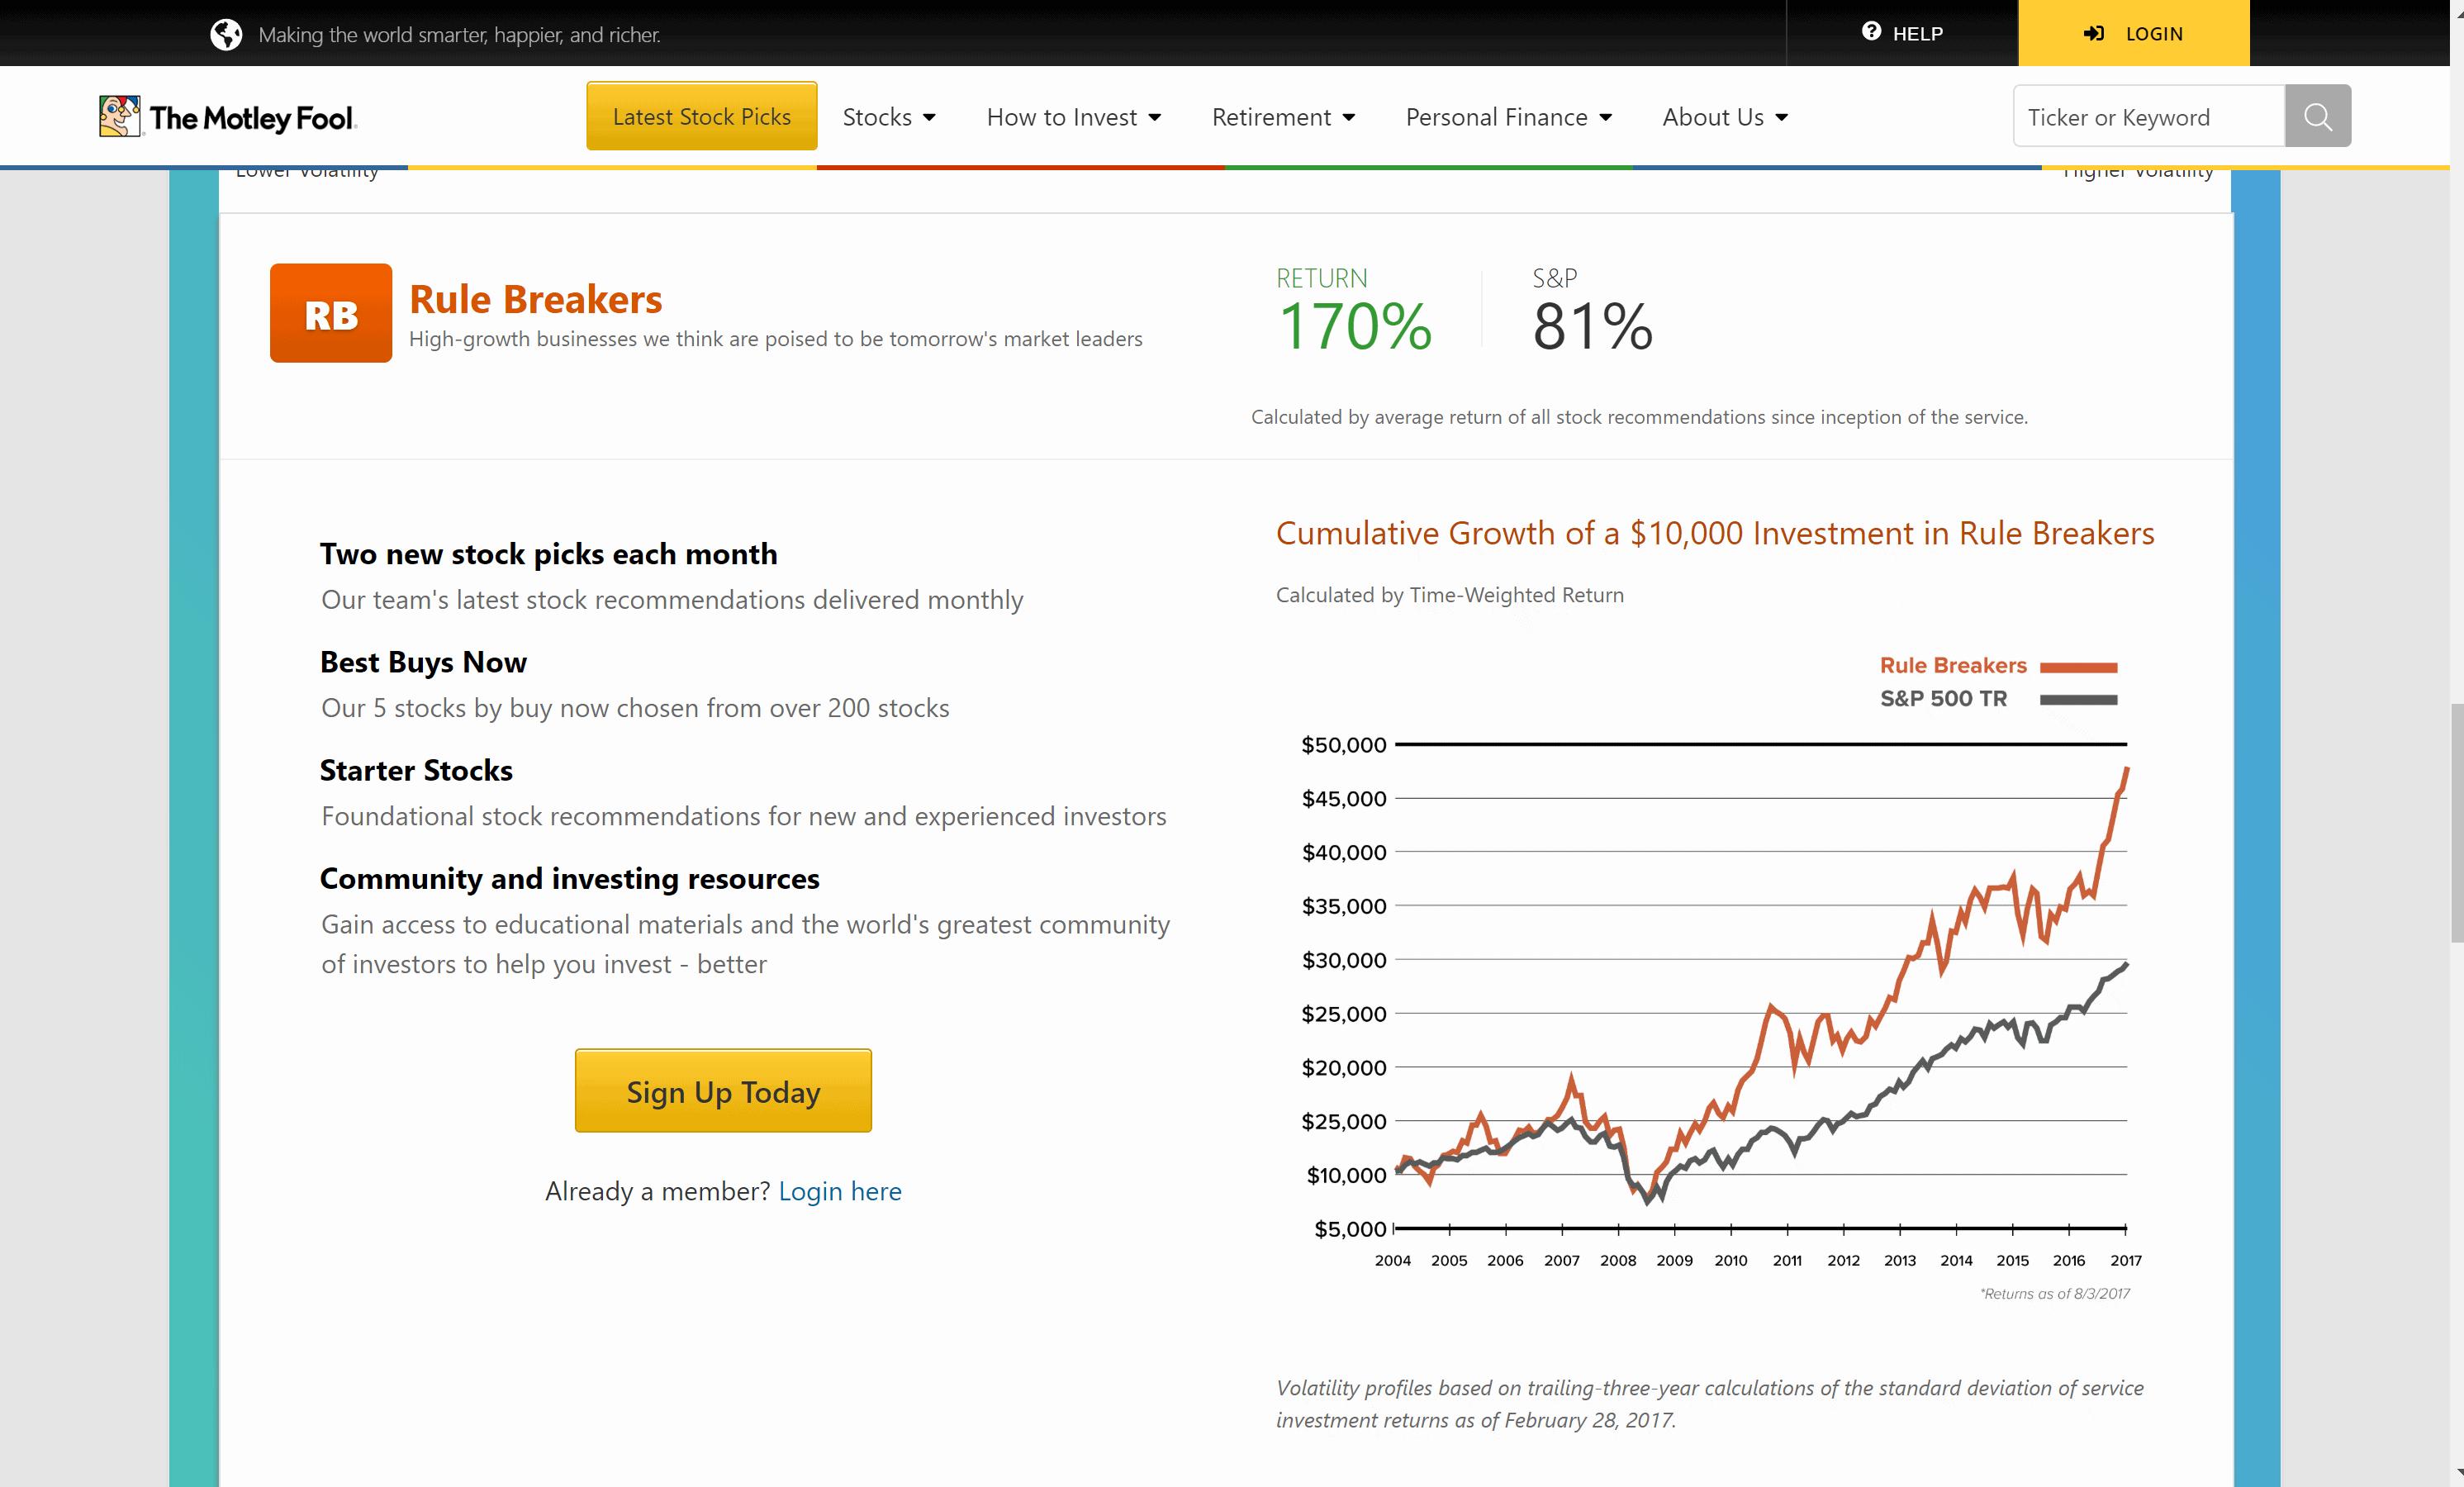 Best Stock to buy